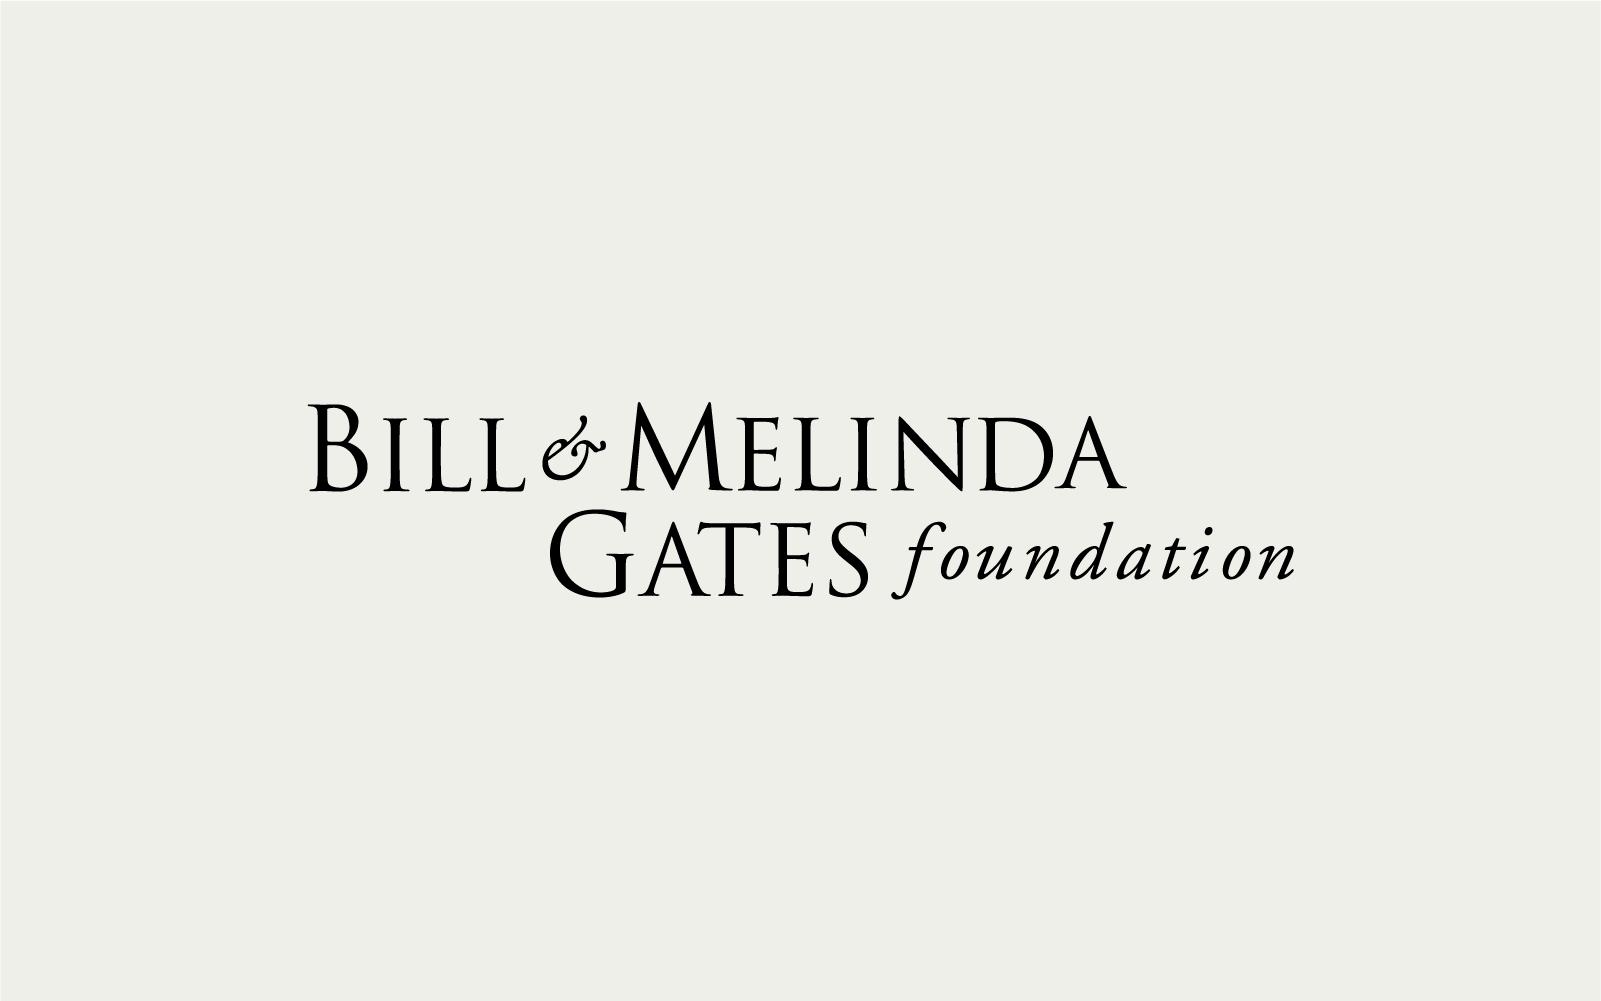 Foundation Fact Sheet - Bill & Melinda Gates Foundation